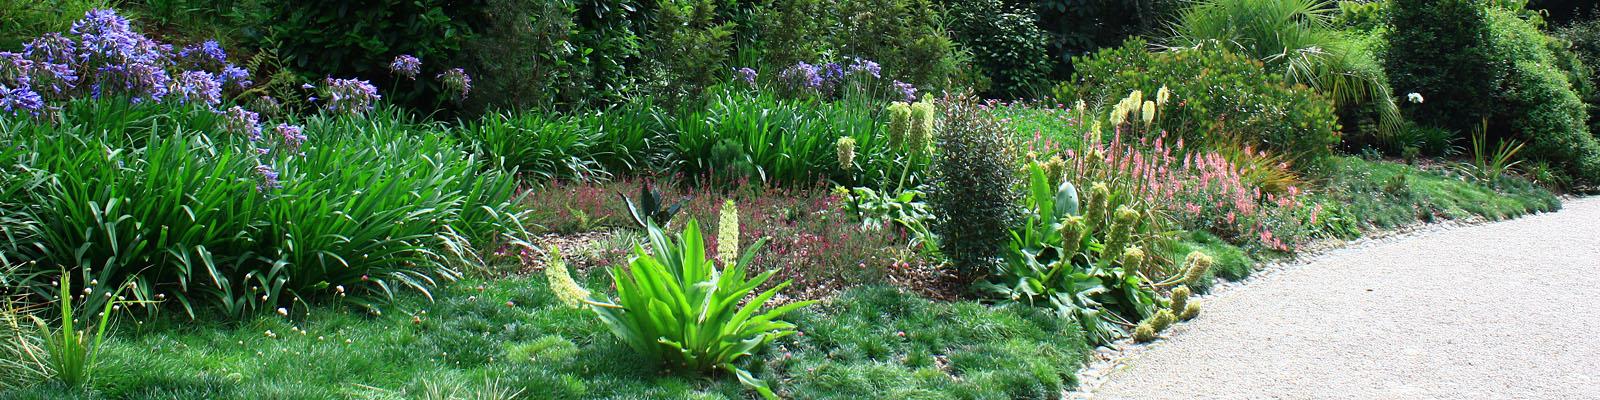 The Green Parrot's Garden Blog